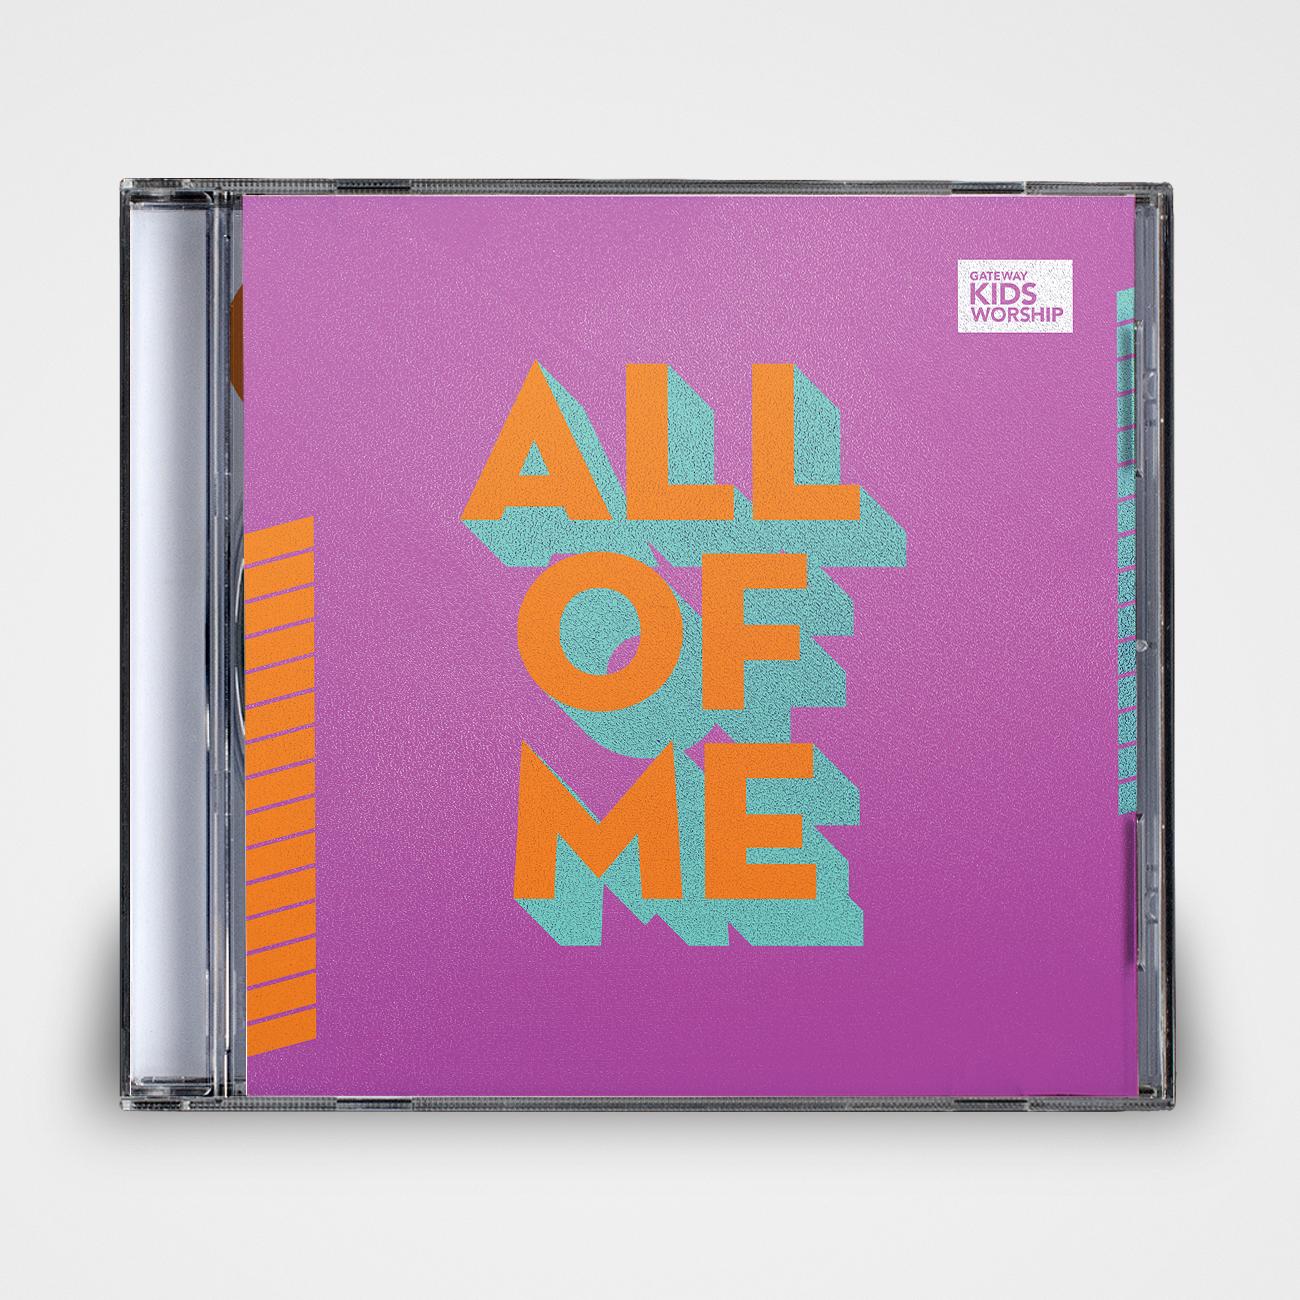 Gateway Kids - All of Me CD *PRE-ORDER*